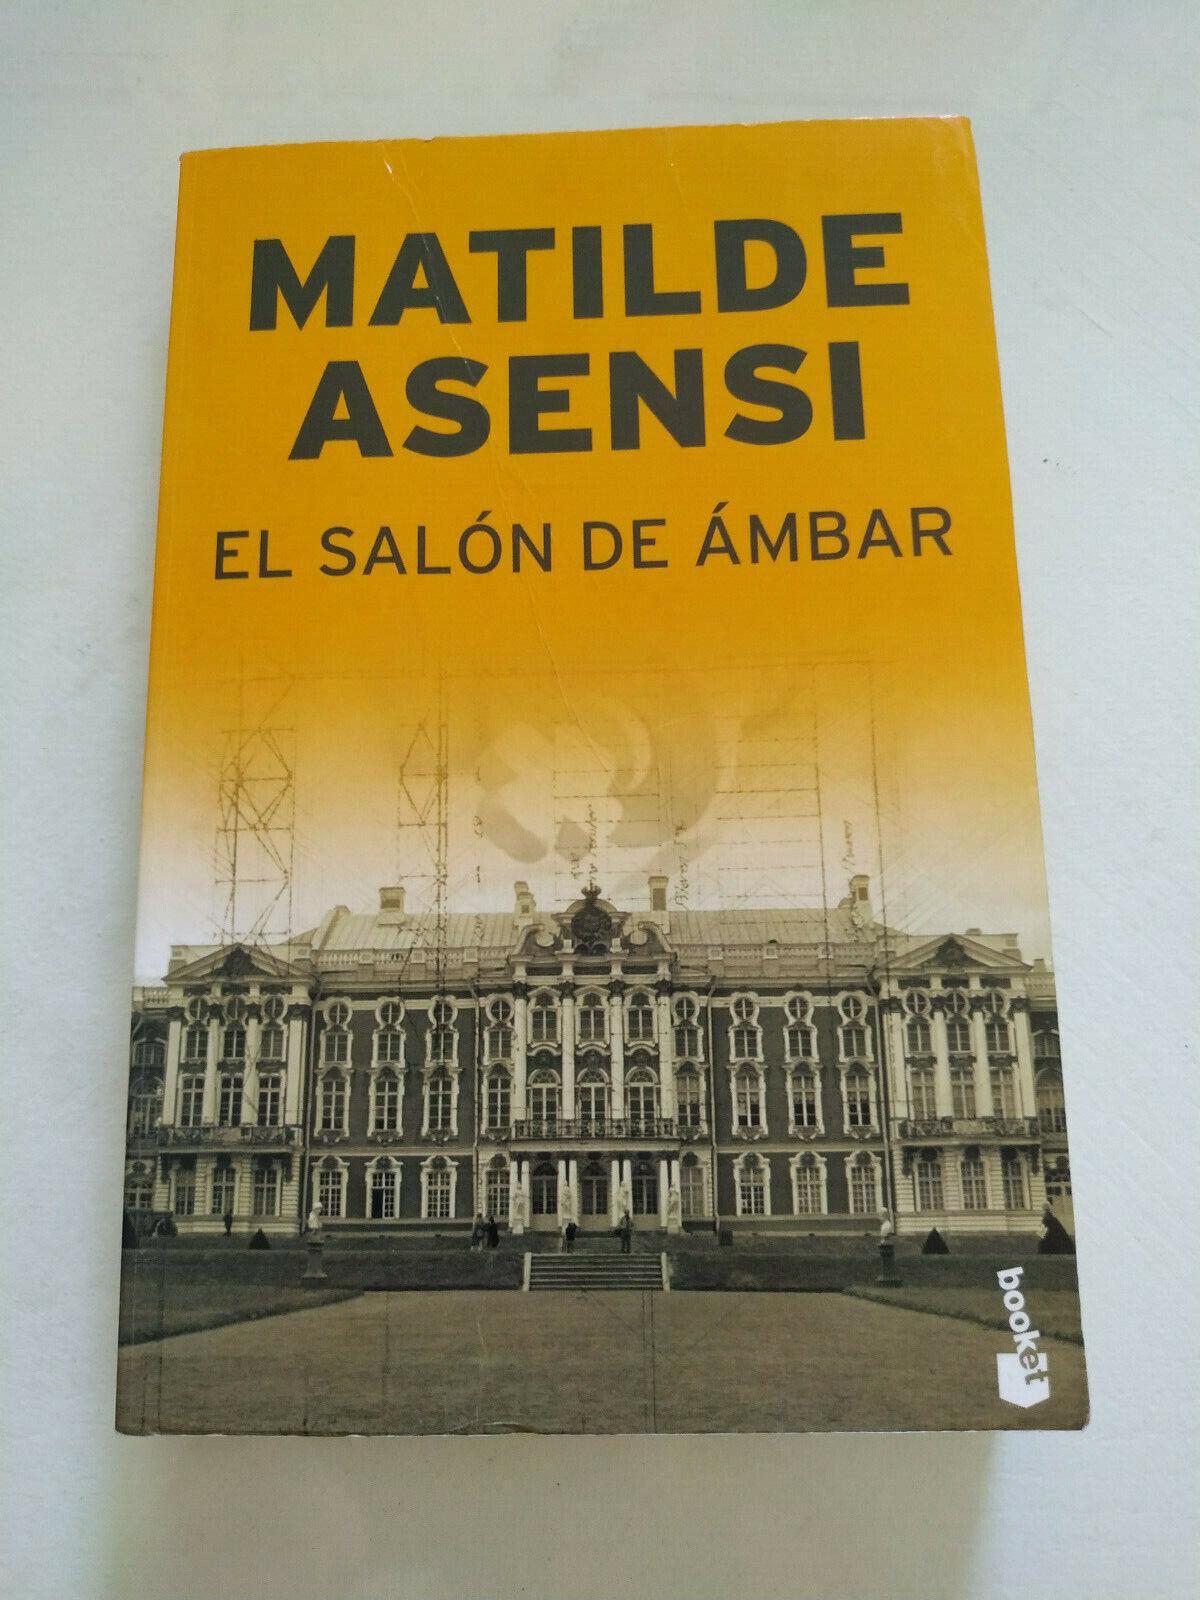 El Salon Ambar Matilde Asensi 2008 Booklet - LIBRO Español - Am